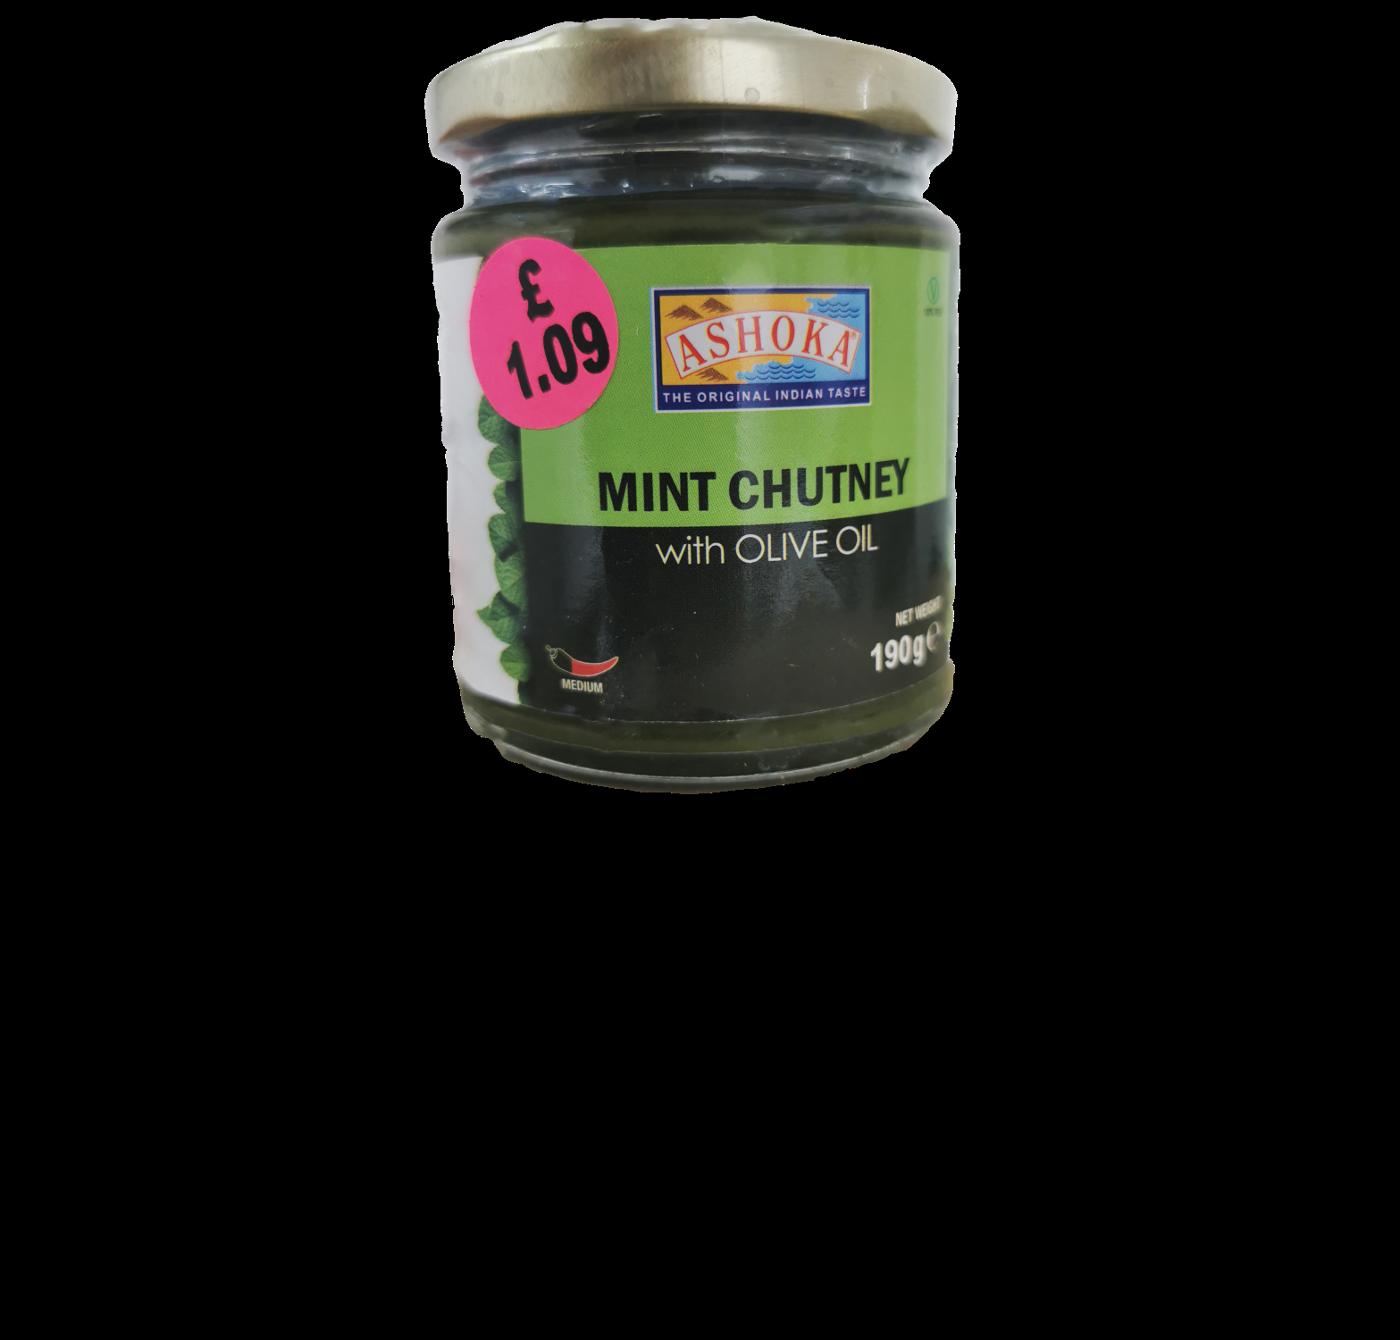 Ashoka Mint Chutney with Olive Oil